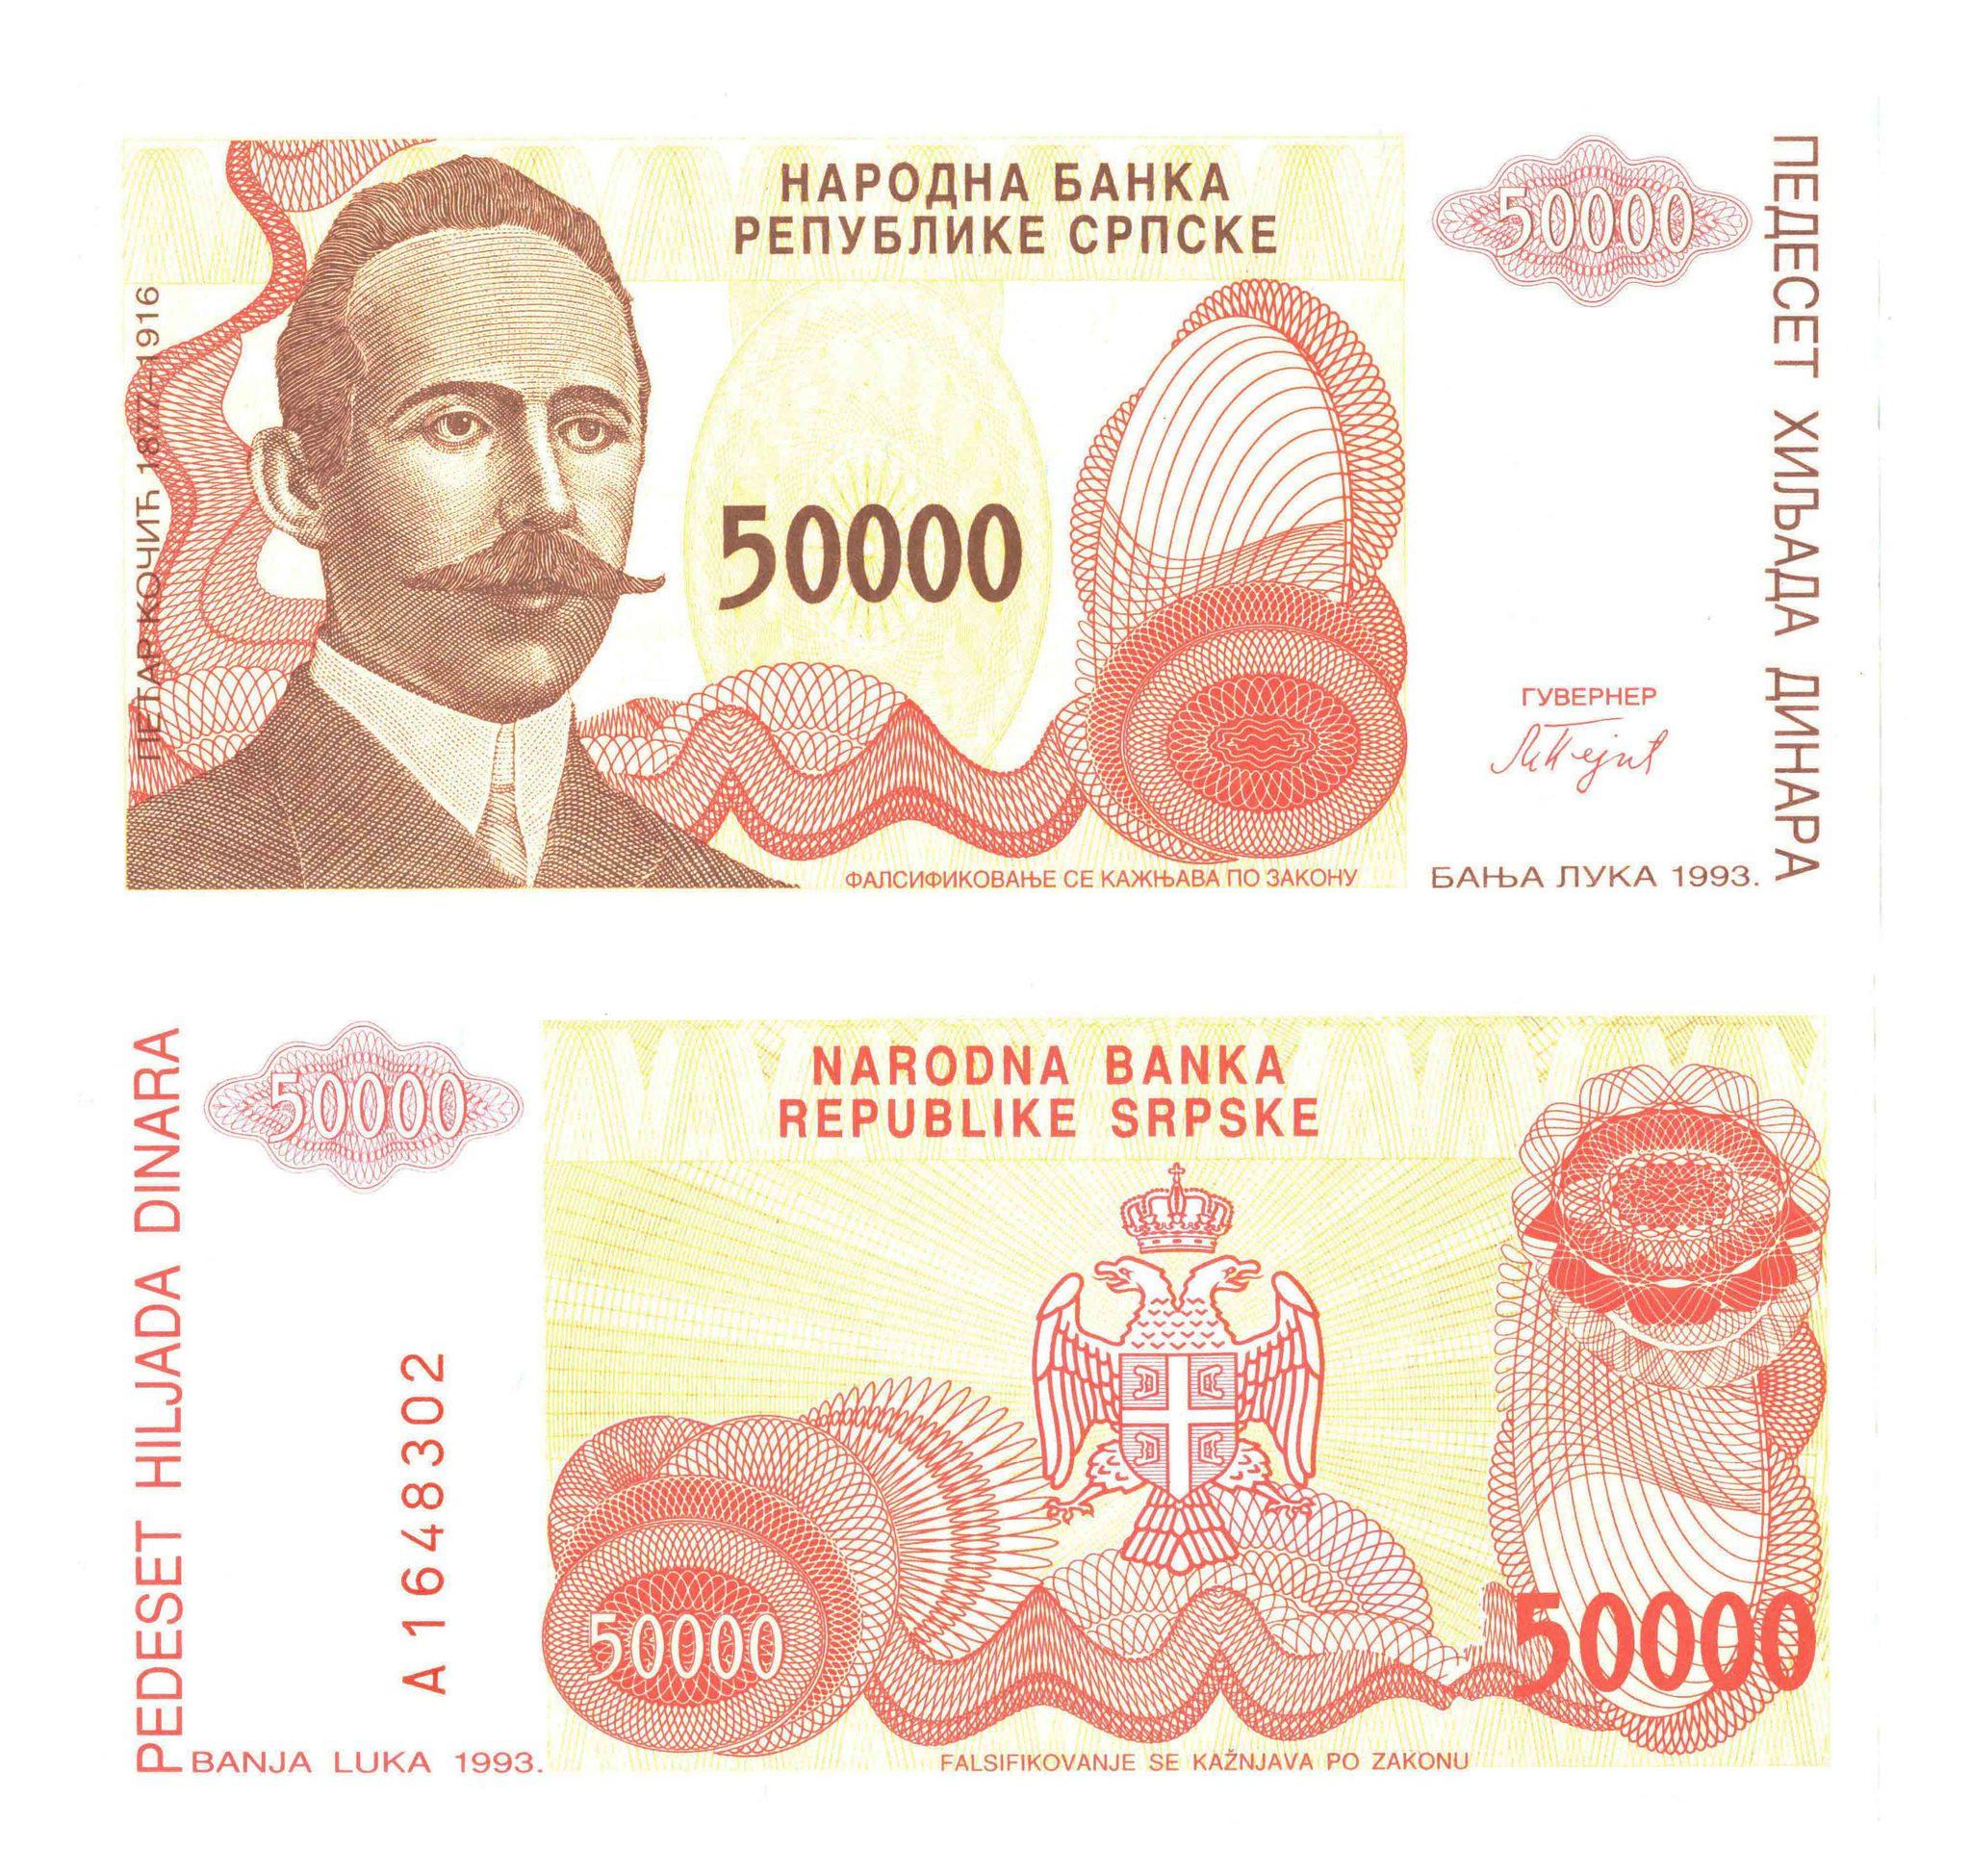 Банкнота 50000 динаров 1993 год, Босния и Герцеговина. UNC